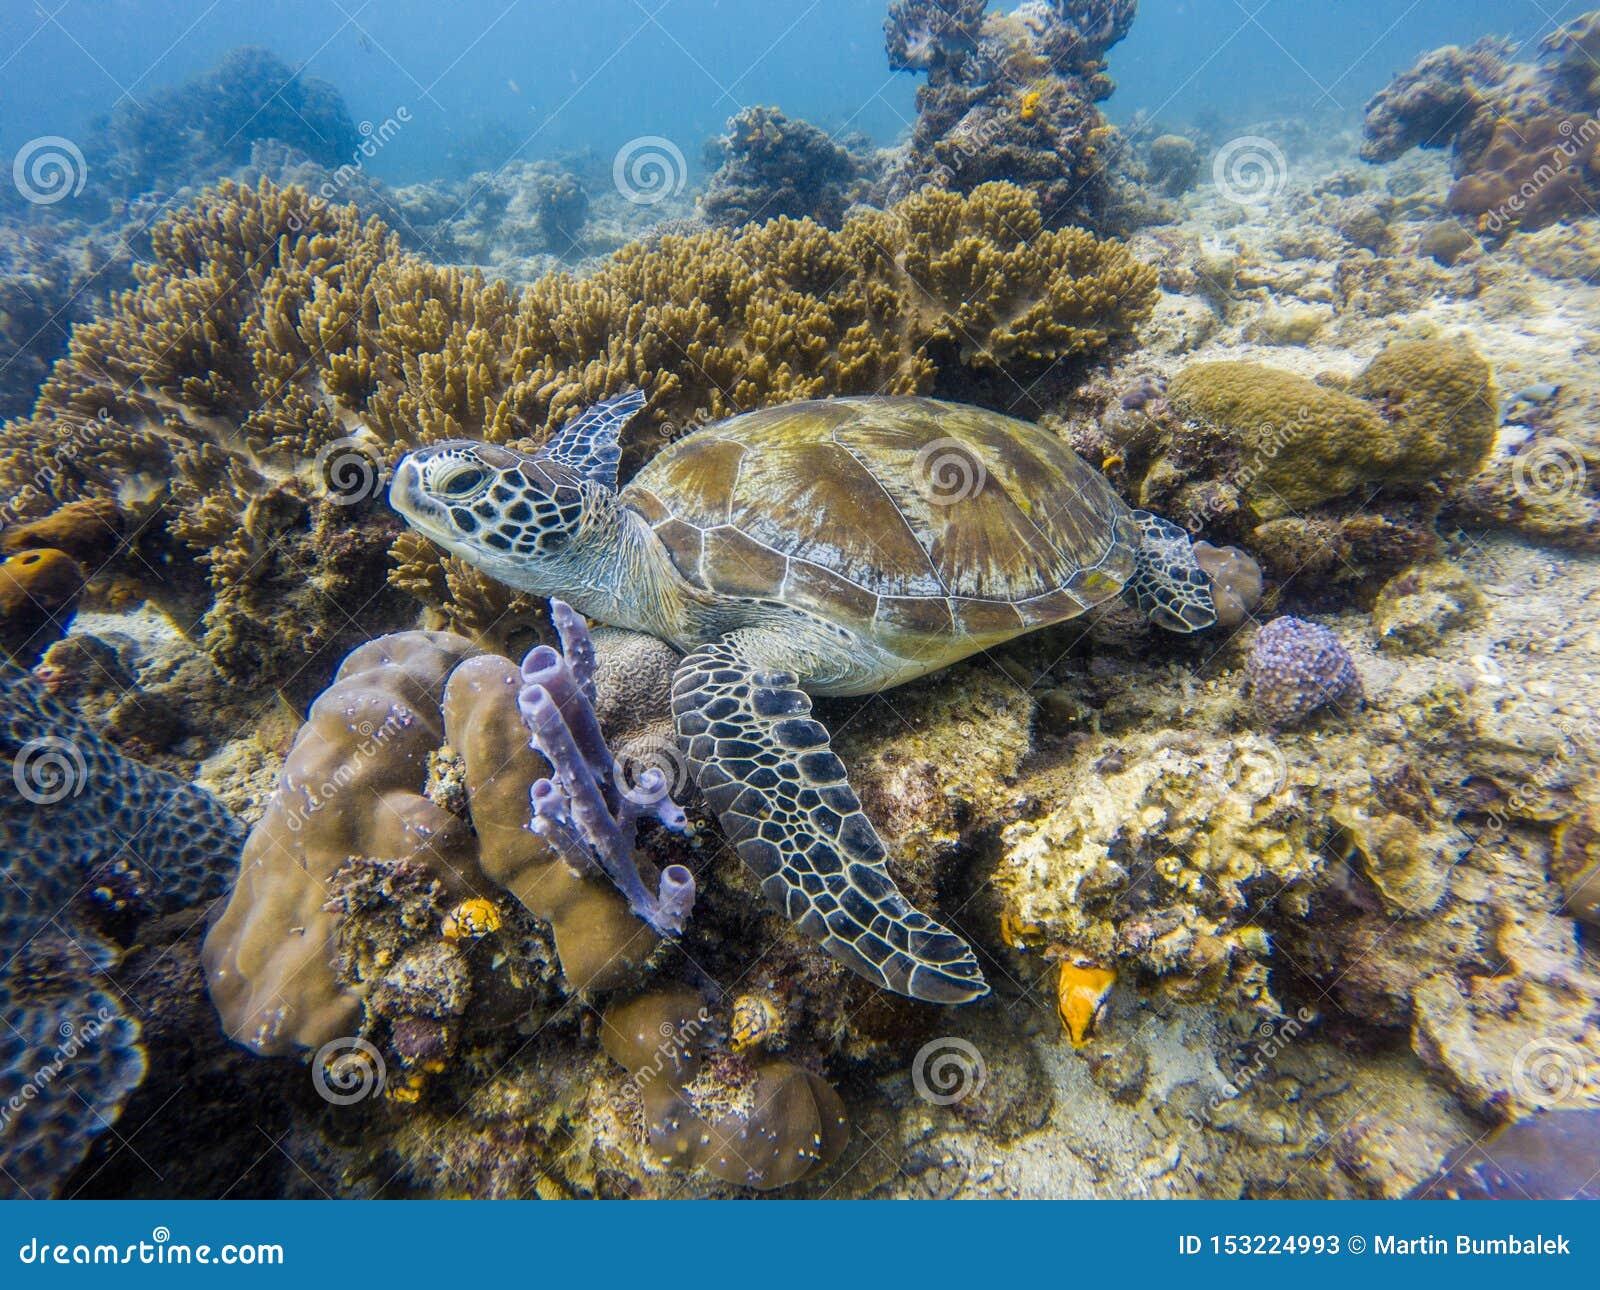 Grön sköldpadda i havet